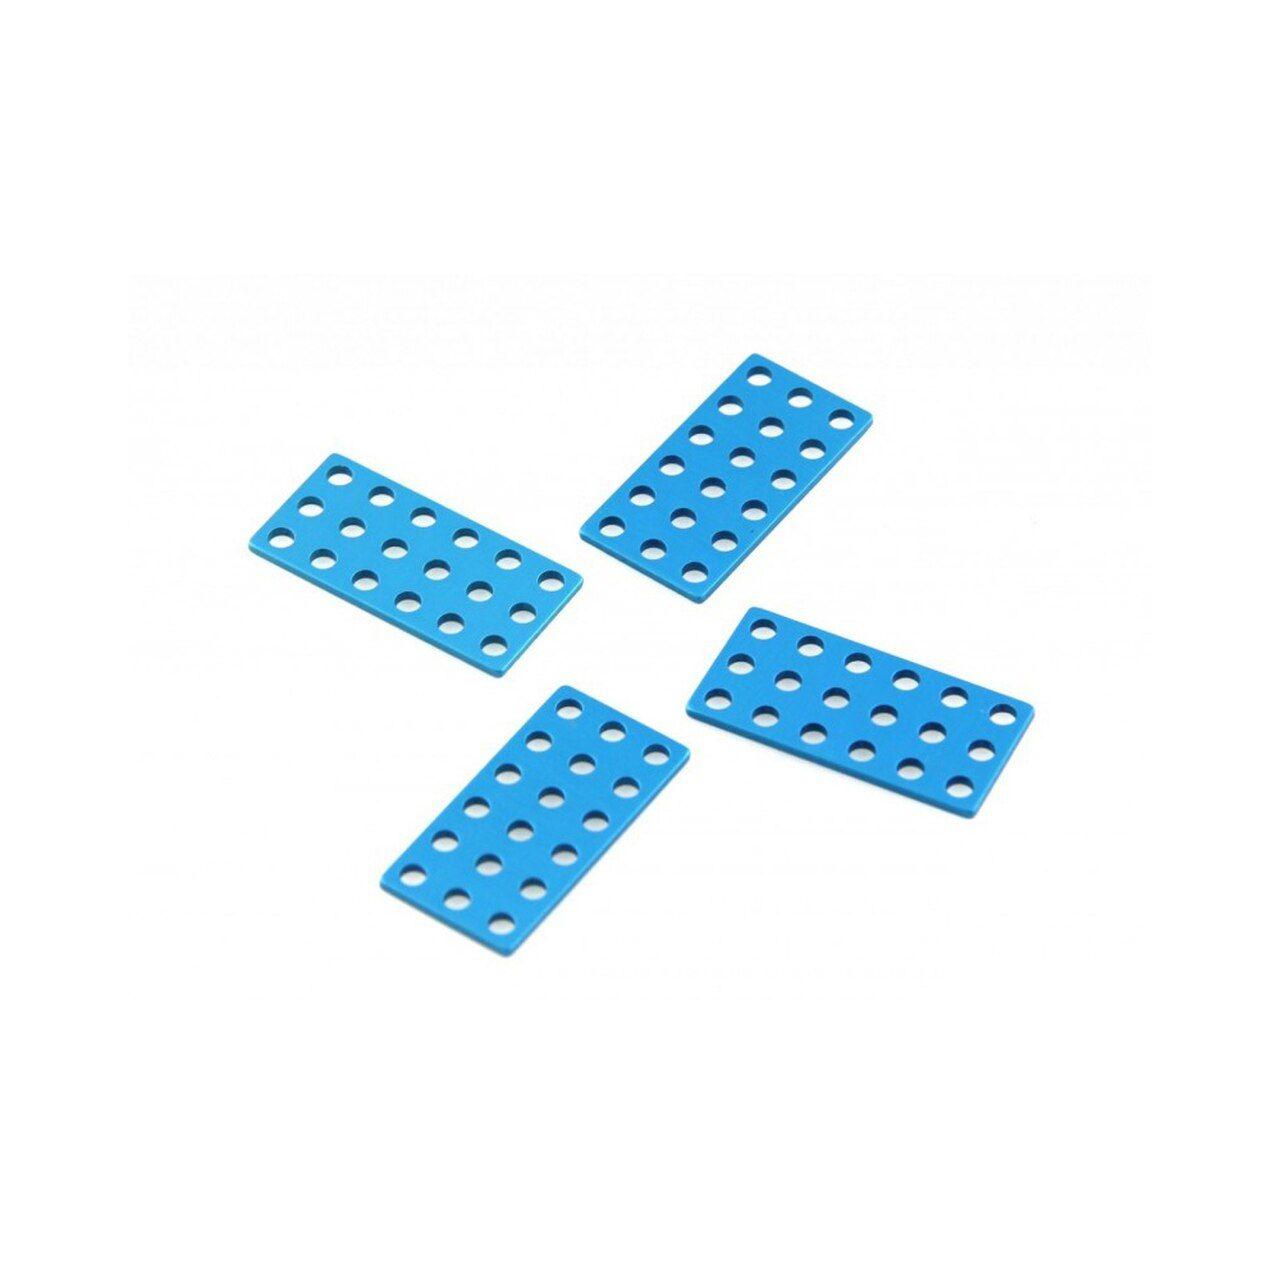 Makeblock Plate 3-6-Blue(4-Pack)